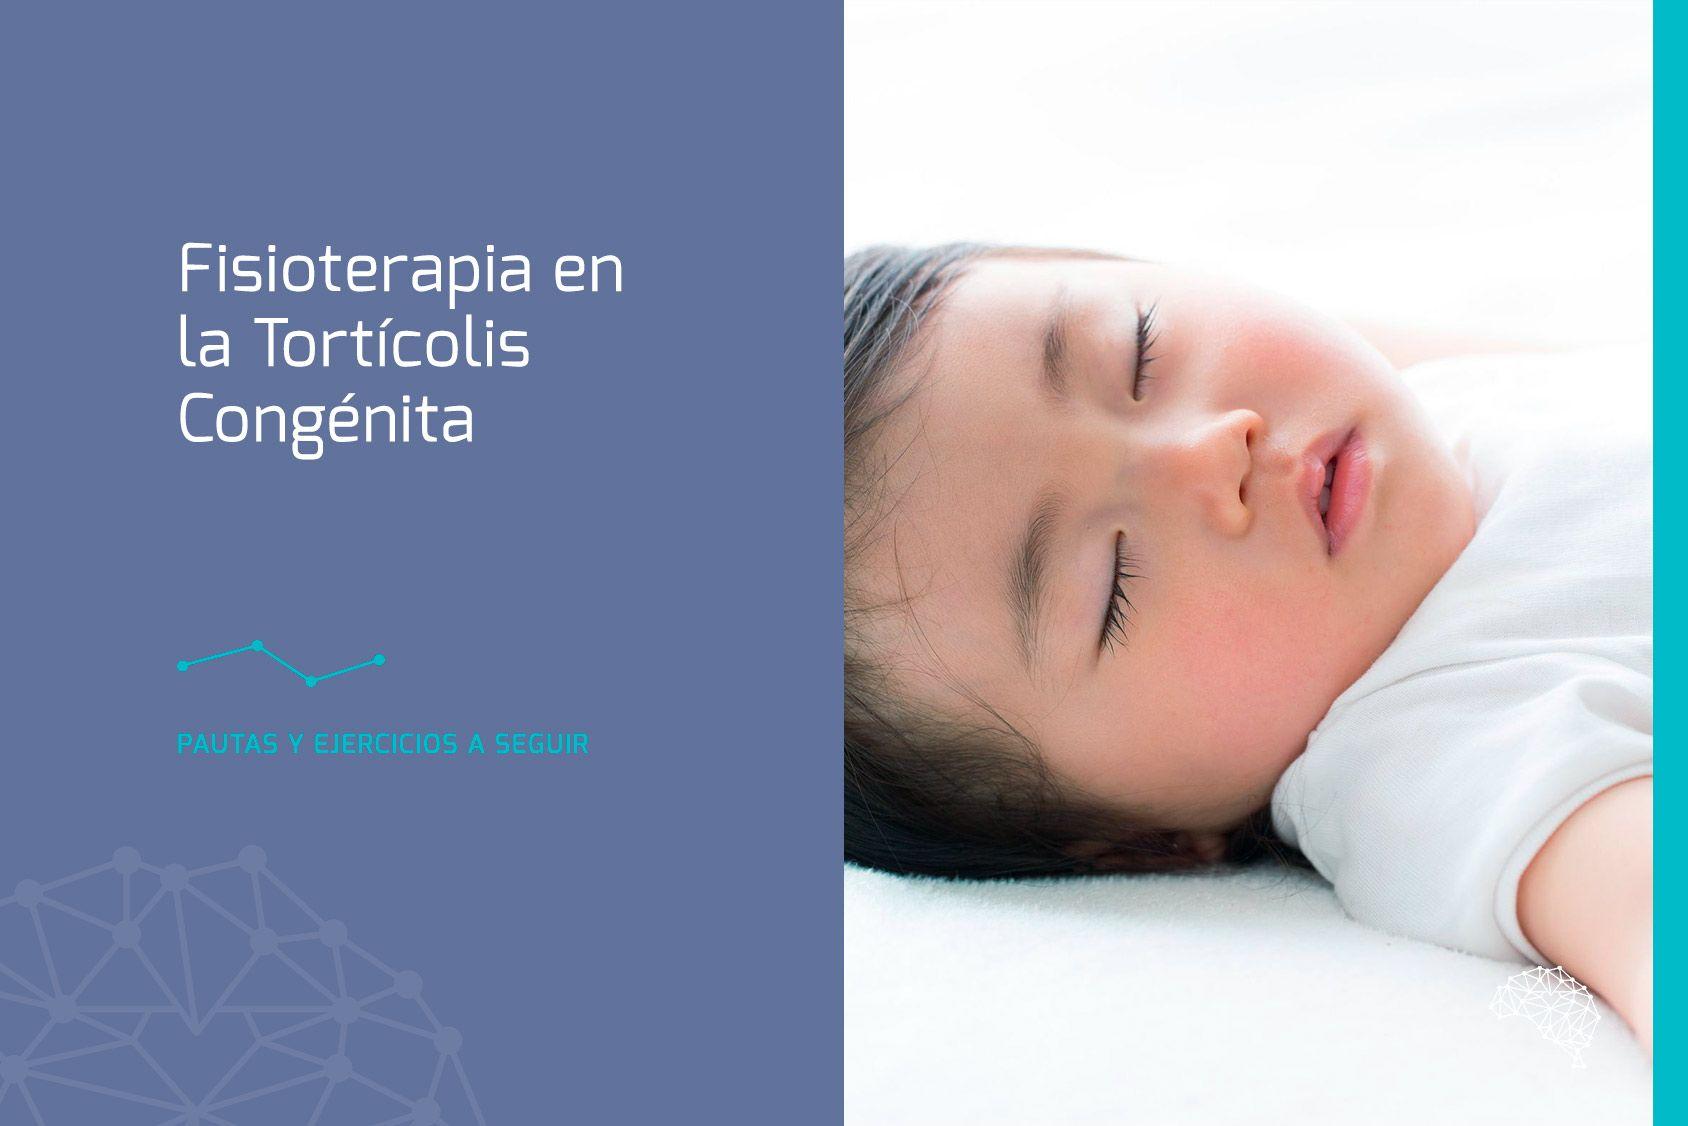 torticolis congenita